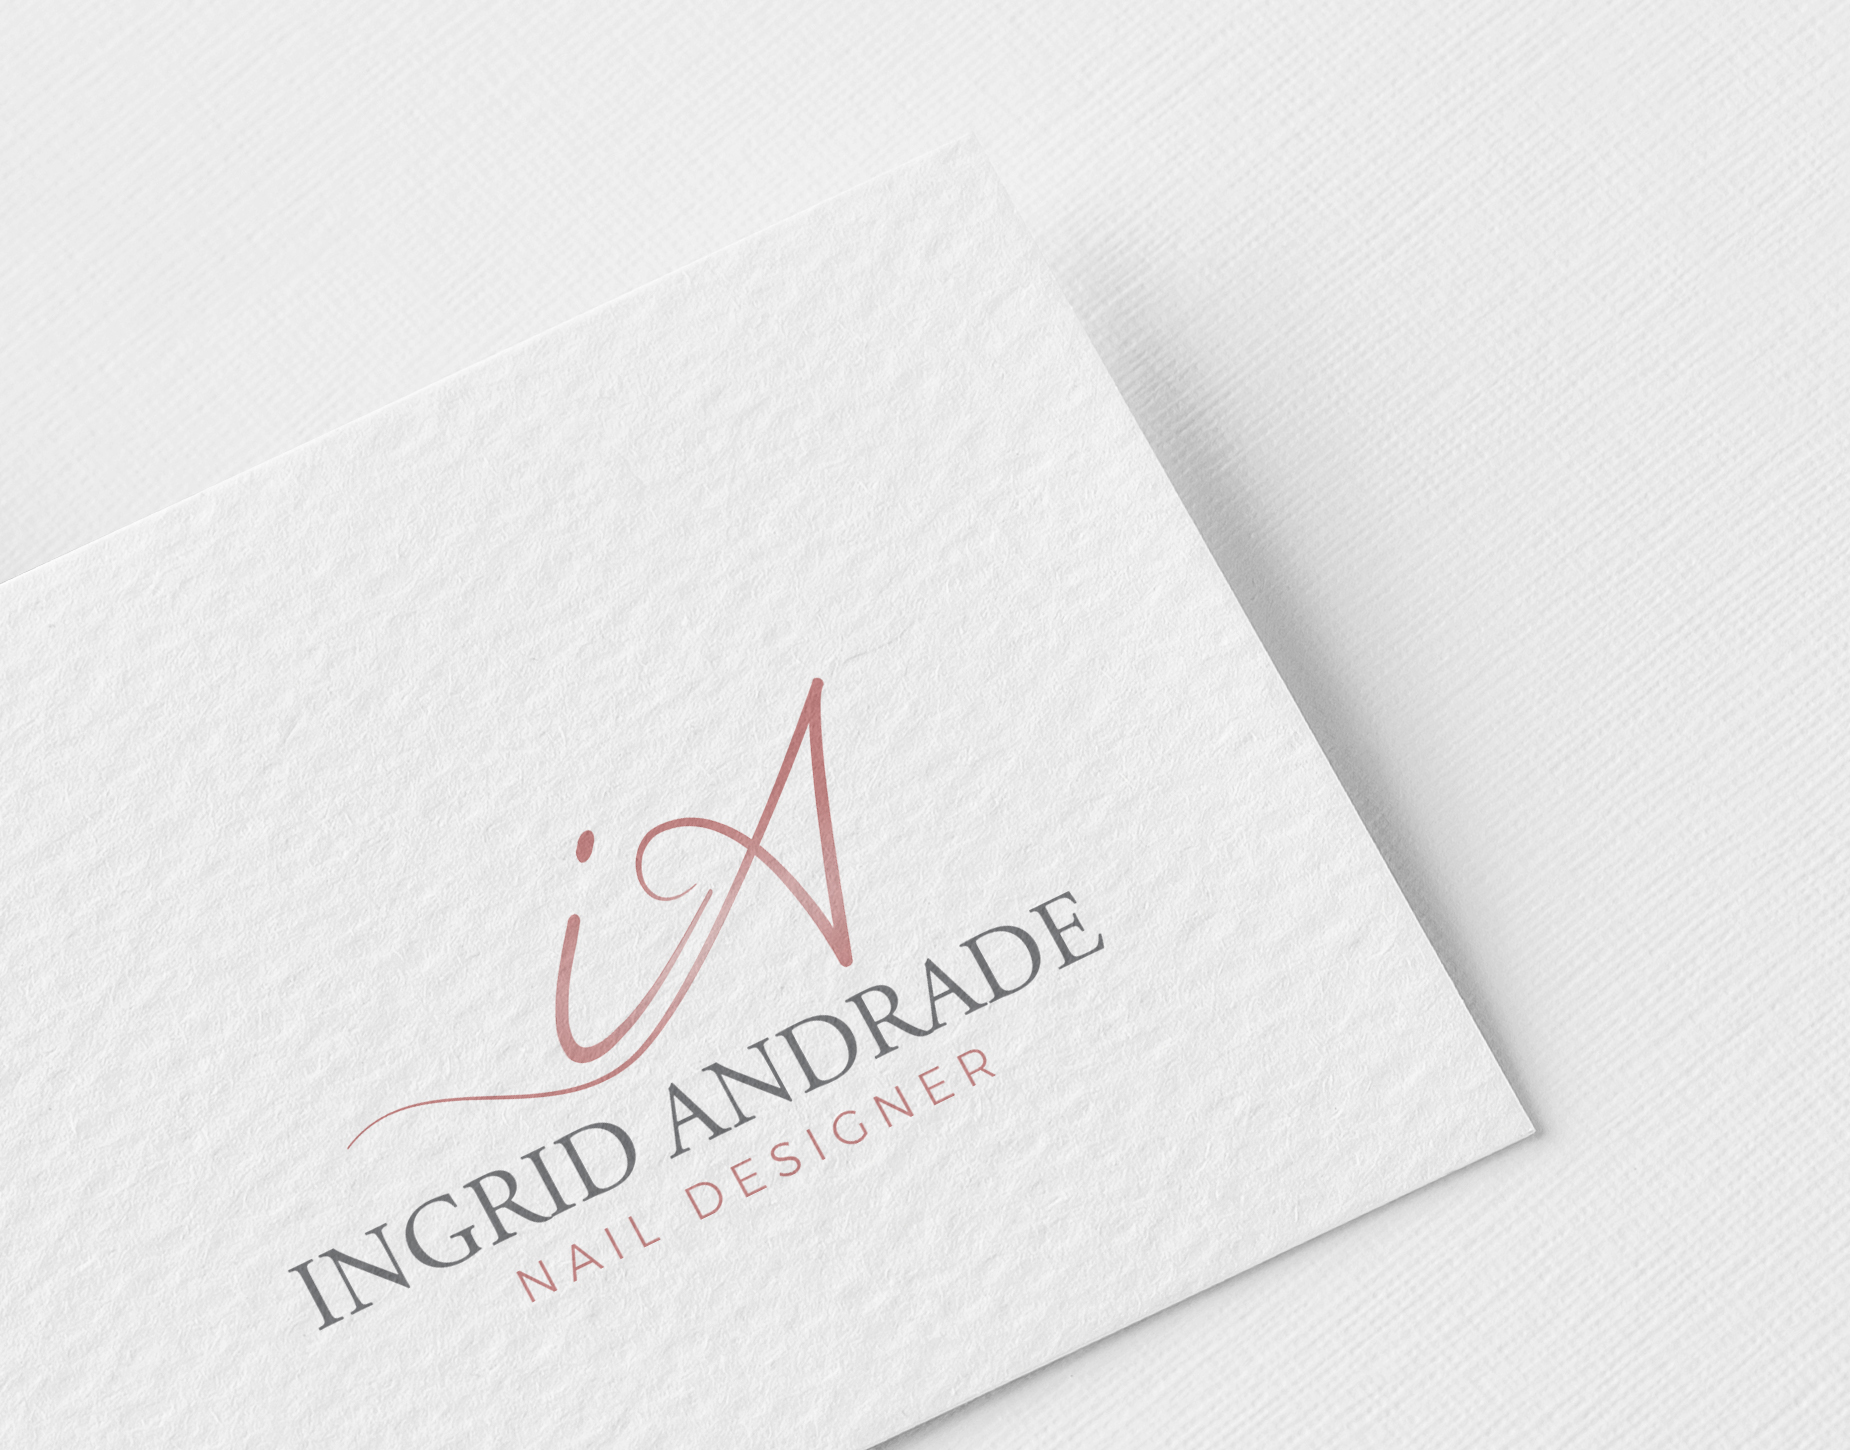 Logo Ingrid Andrade